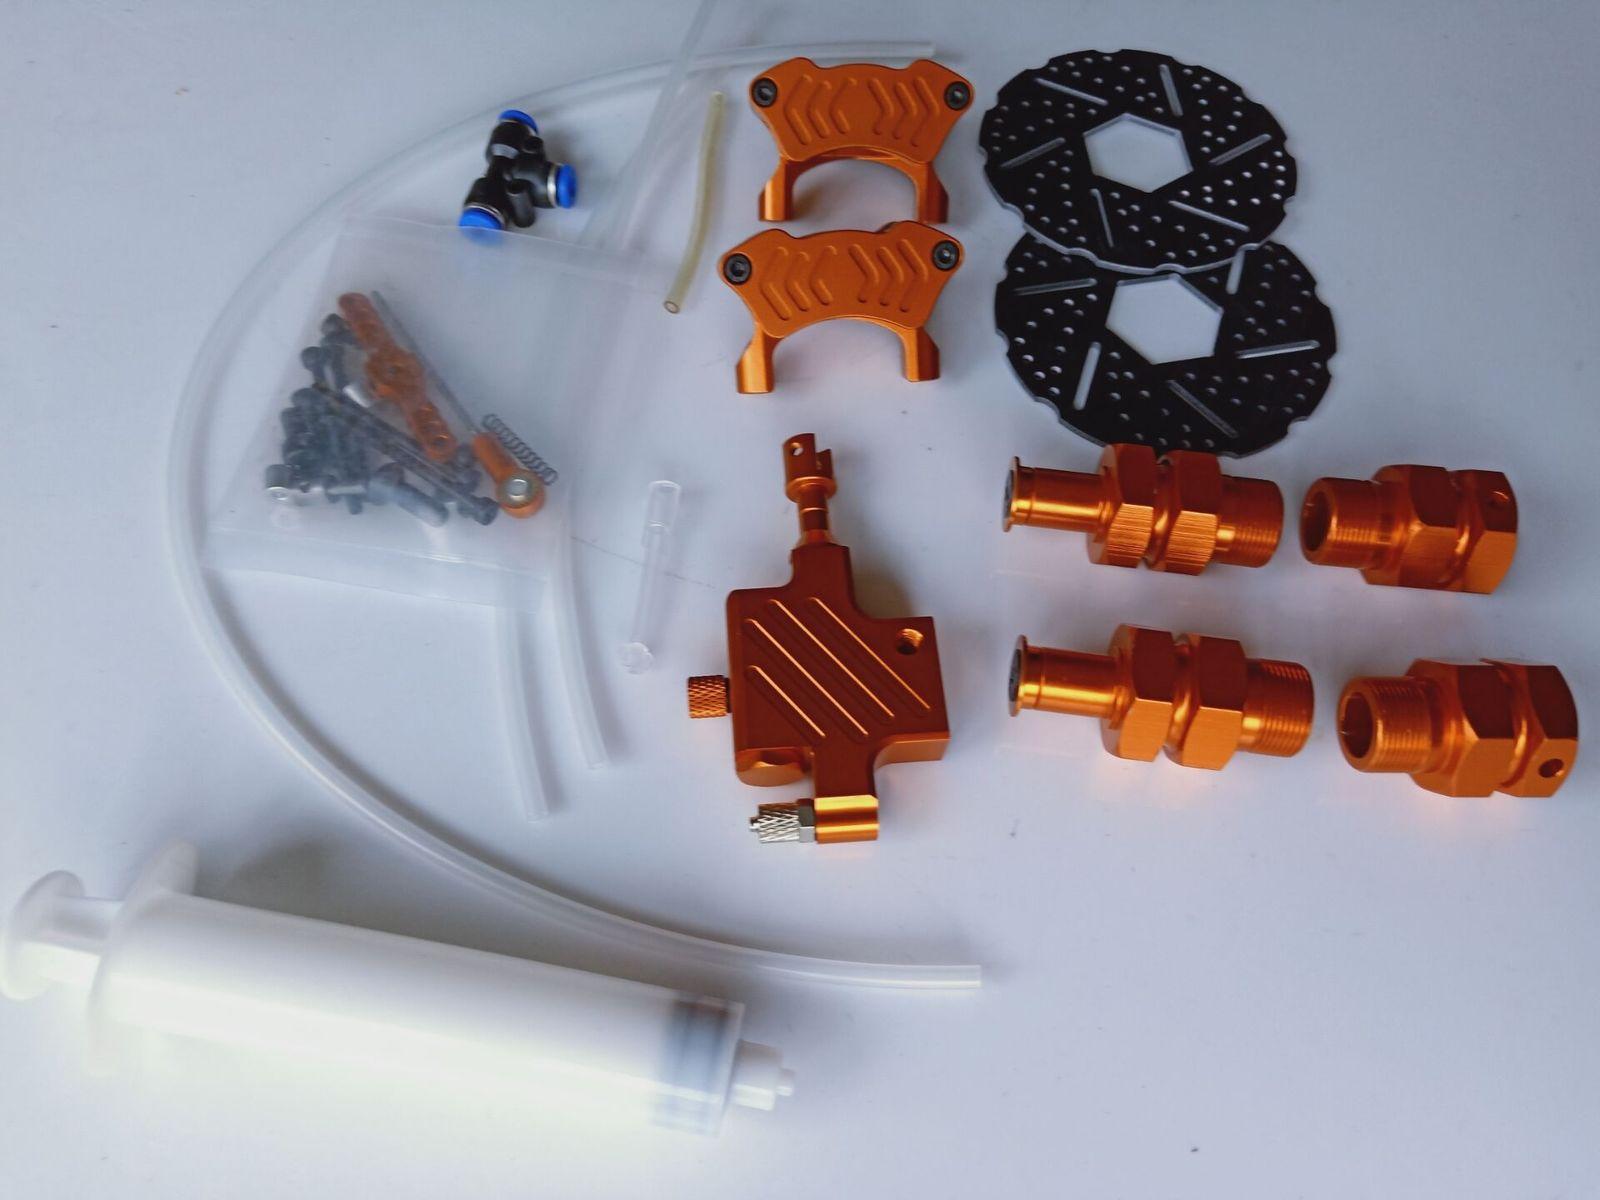 Front Hydraulic Brake System for HPI km rovan Baja 5B orange color baja 5b metal cnc alloy rim fit hpi km rovan orange red color